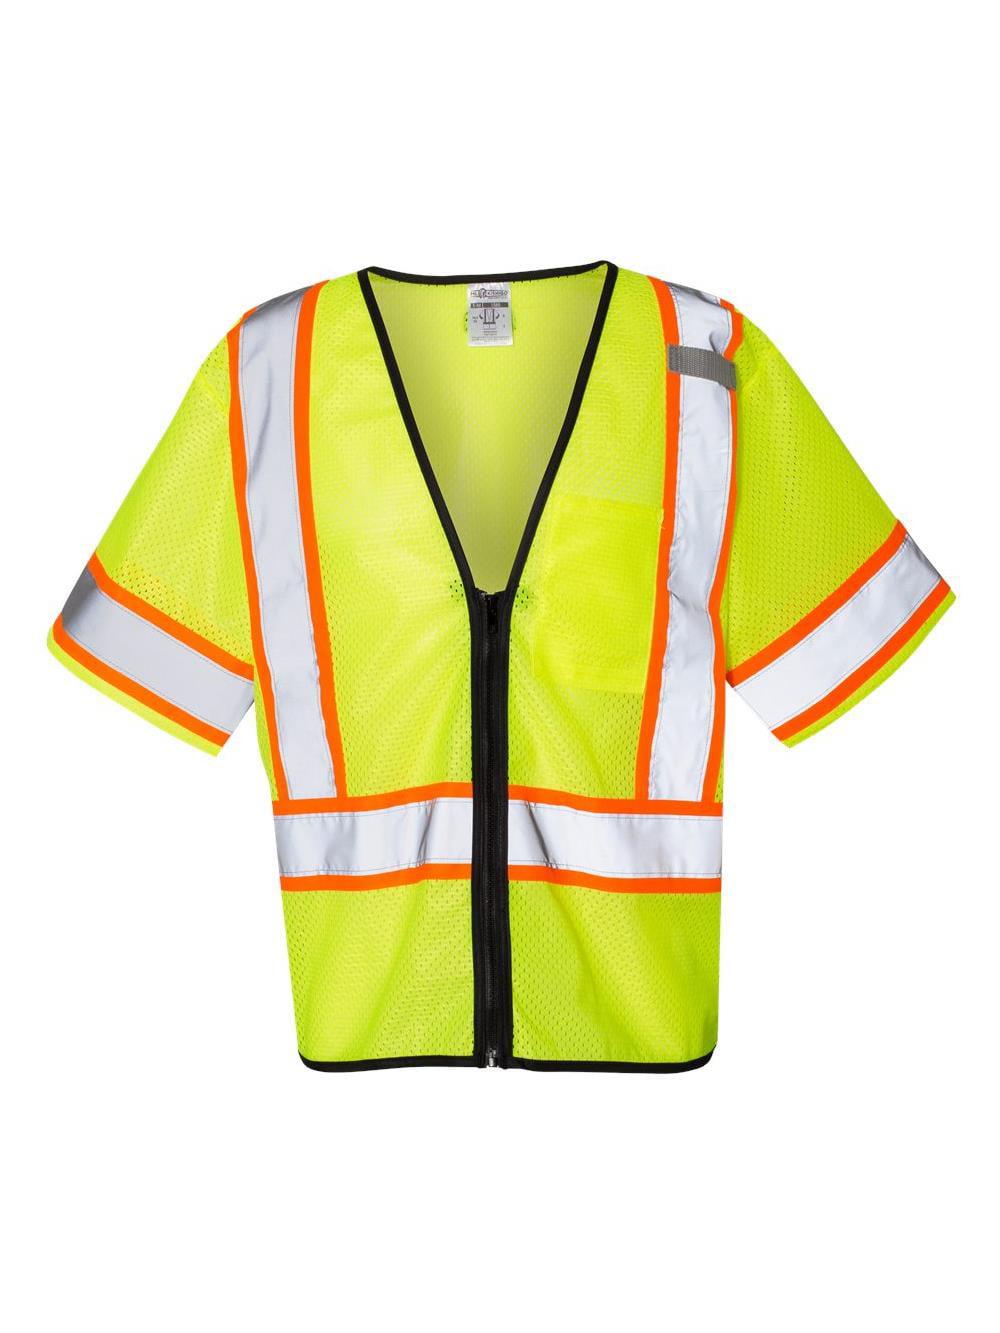 ML Kishigo Workwear Economy Single Pocket Contrasting Mesh Vest 1565-1566